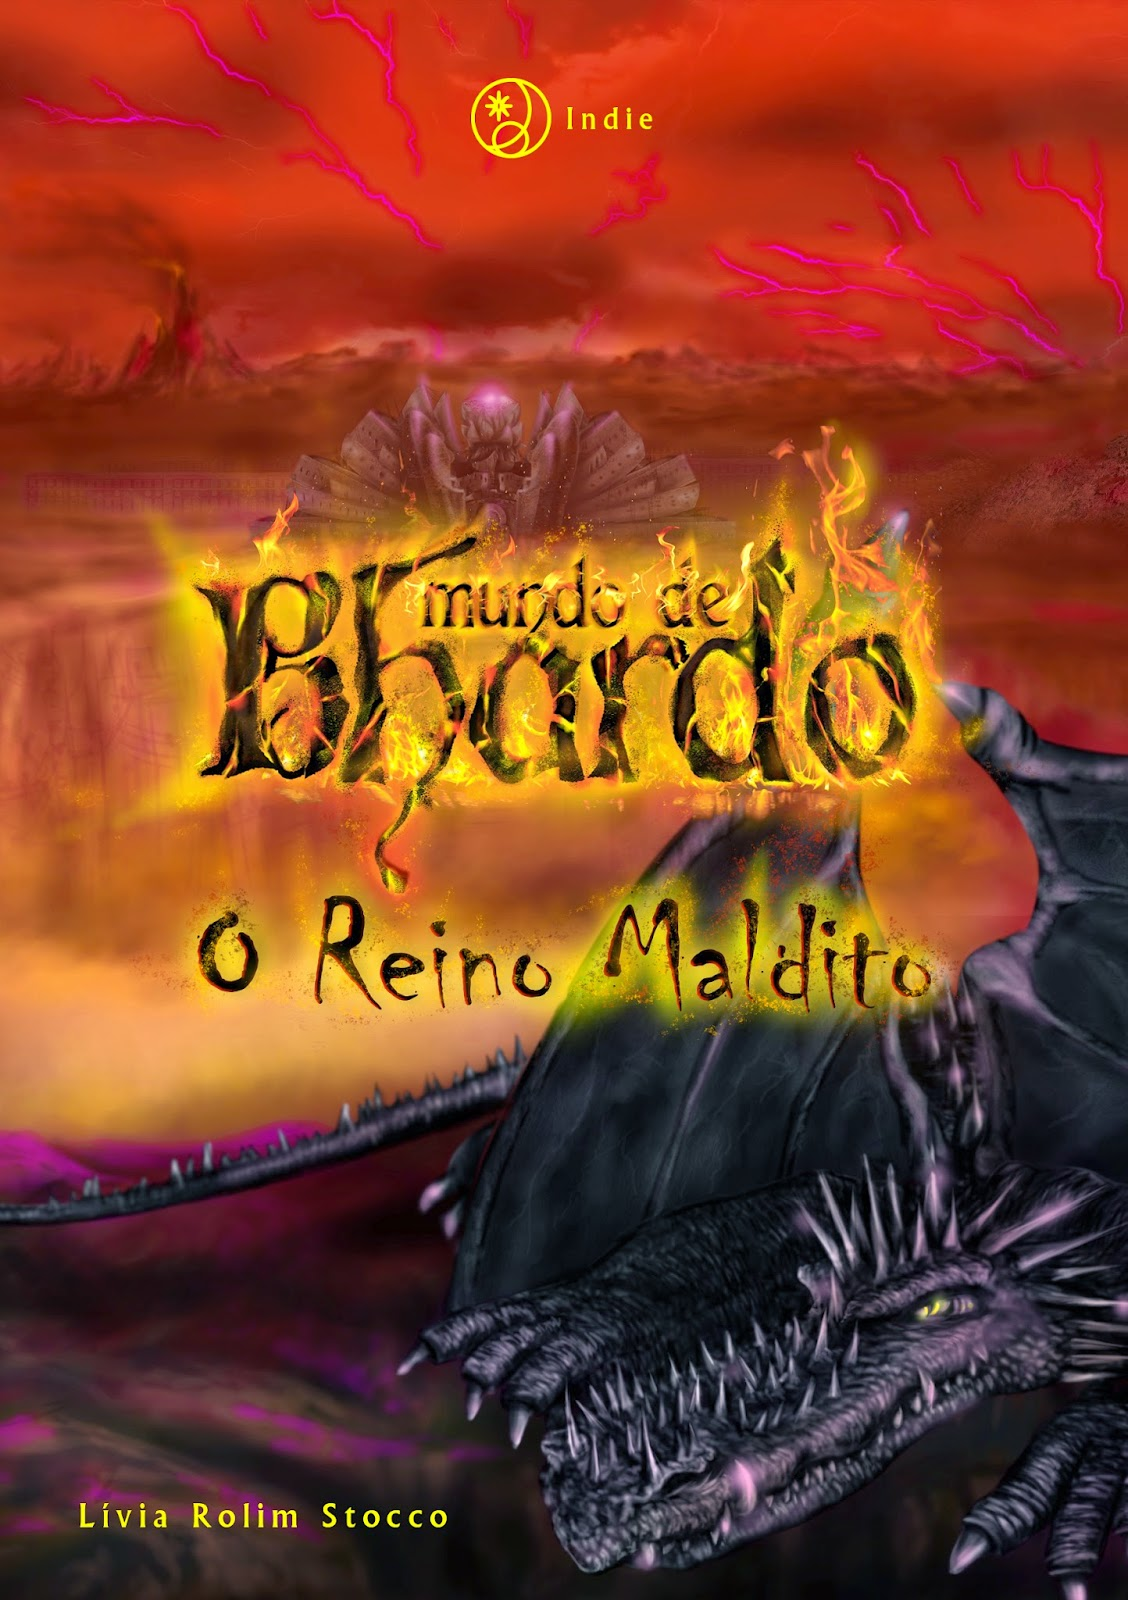 http://www.amazon.com.br/O-Reino-Maldito-Mundo-Bhardo-ebook/dp/B00PKLWMK0/ref=sr_1_4?ie=UTF8&qid=1418756582&sr=8-4&keywords=bhardo